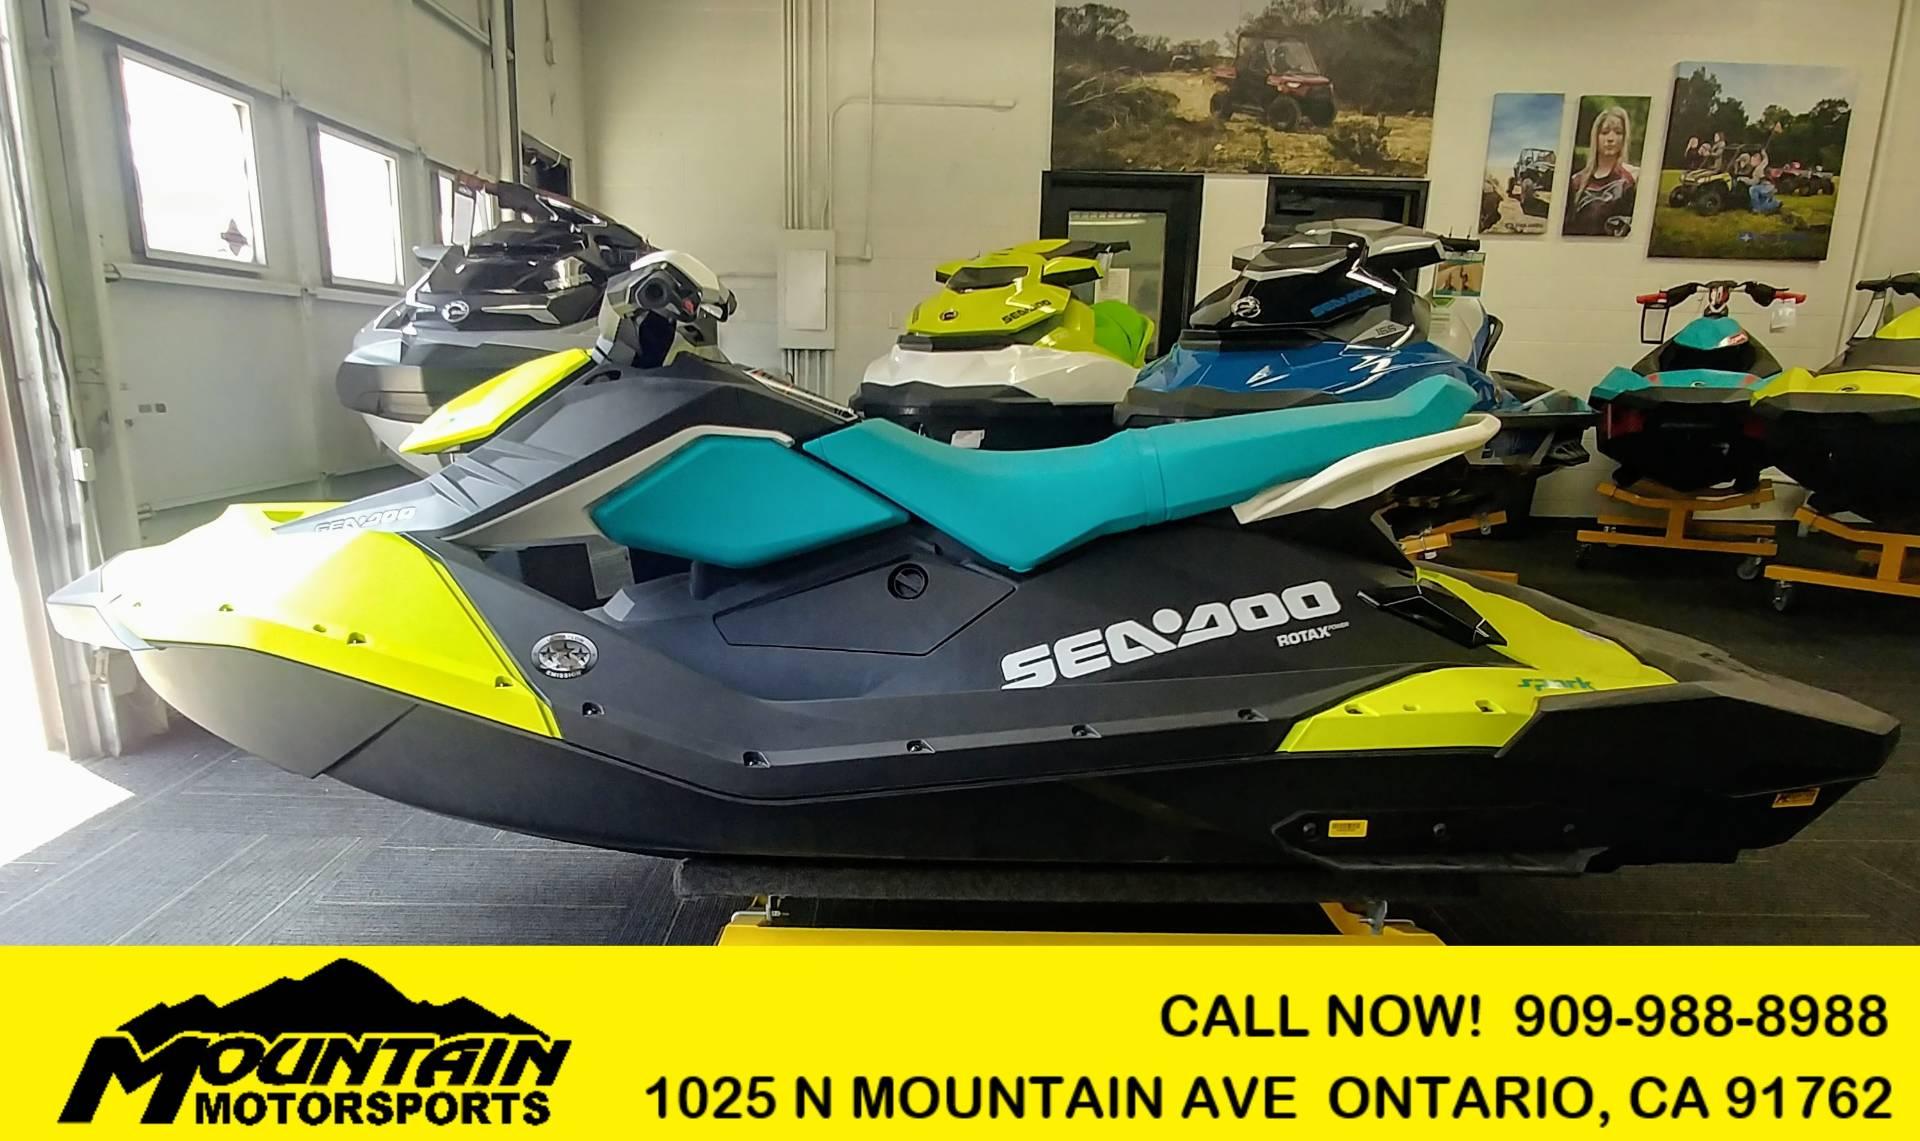 2018 Sea-Doo SPARK 3up 900 H.O. ACE for sale 2231